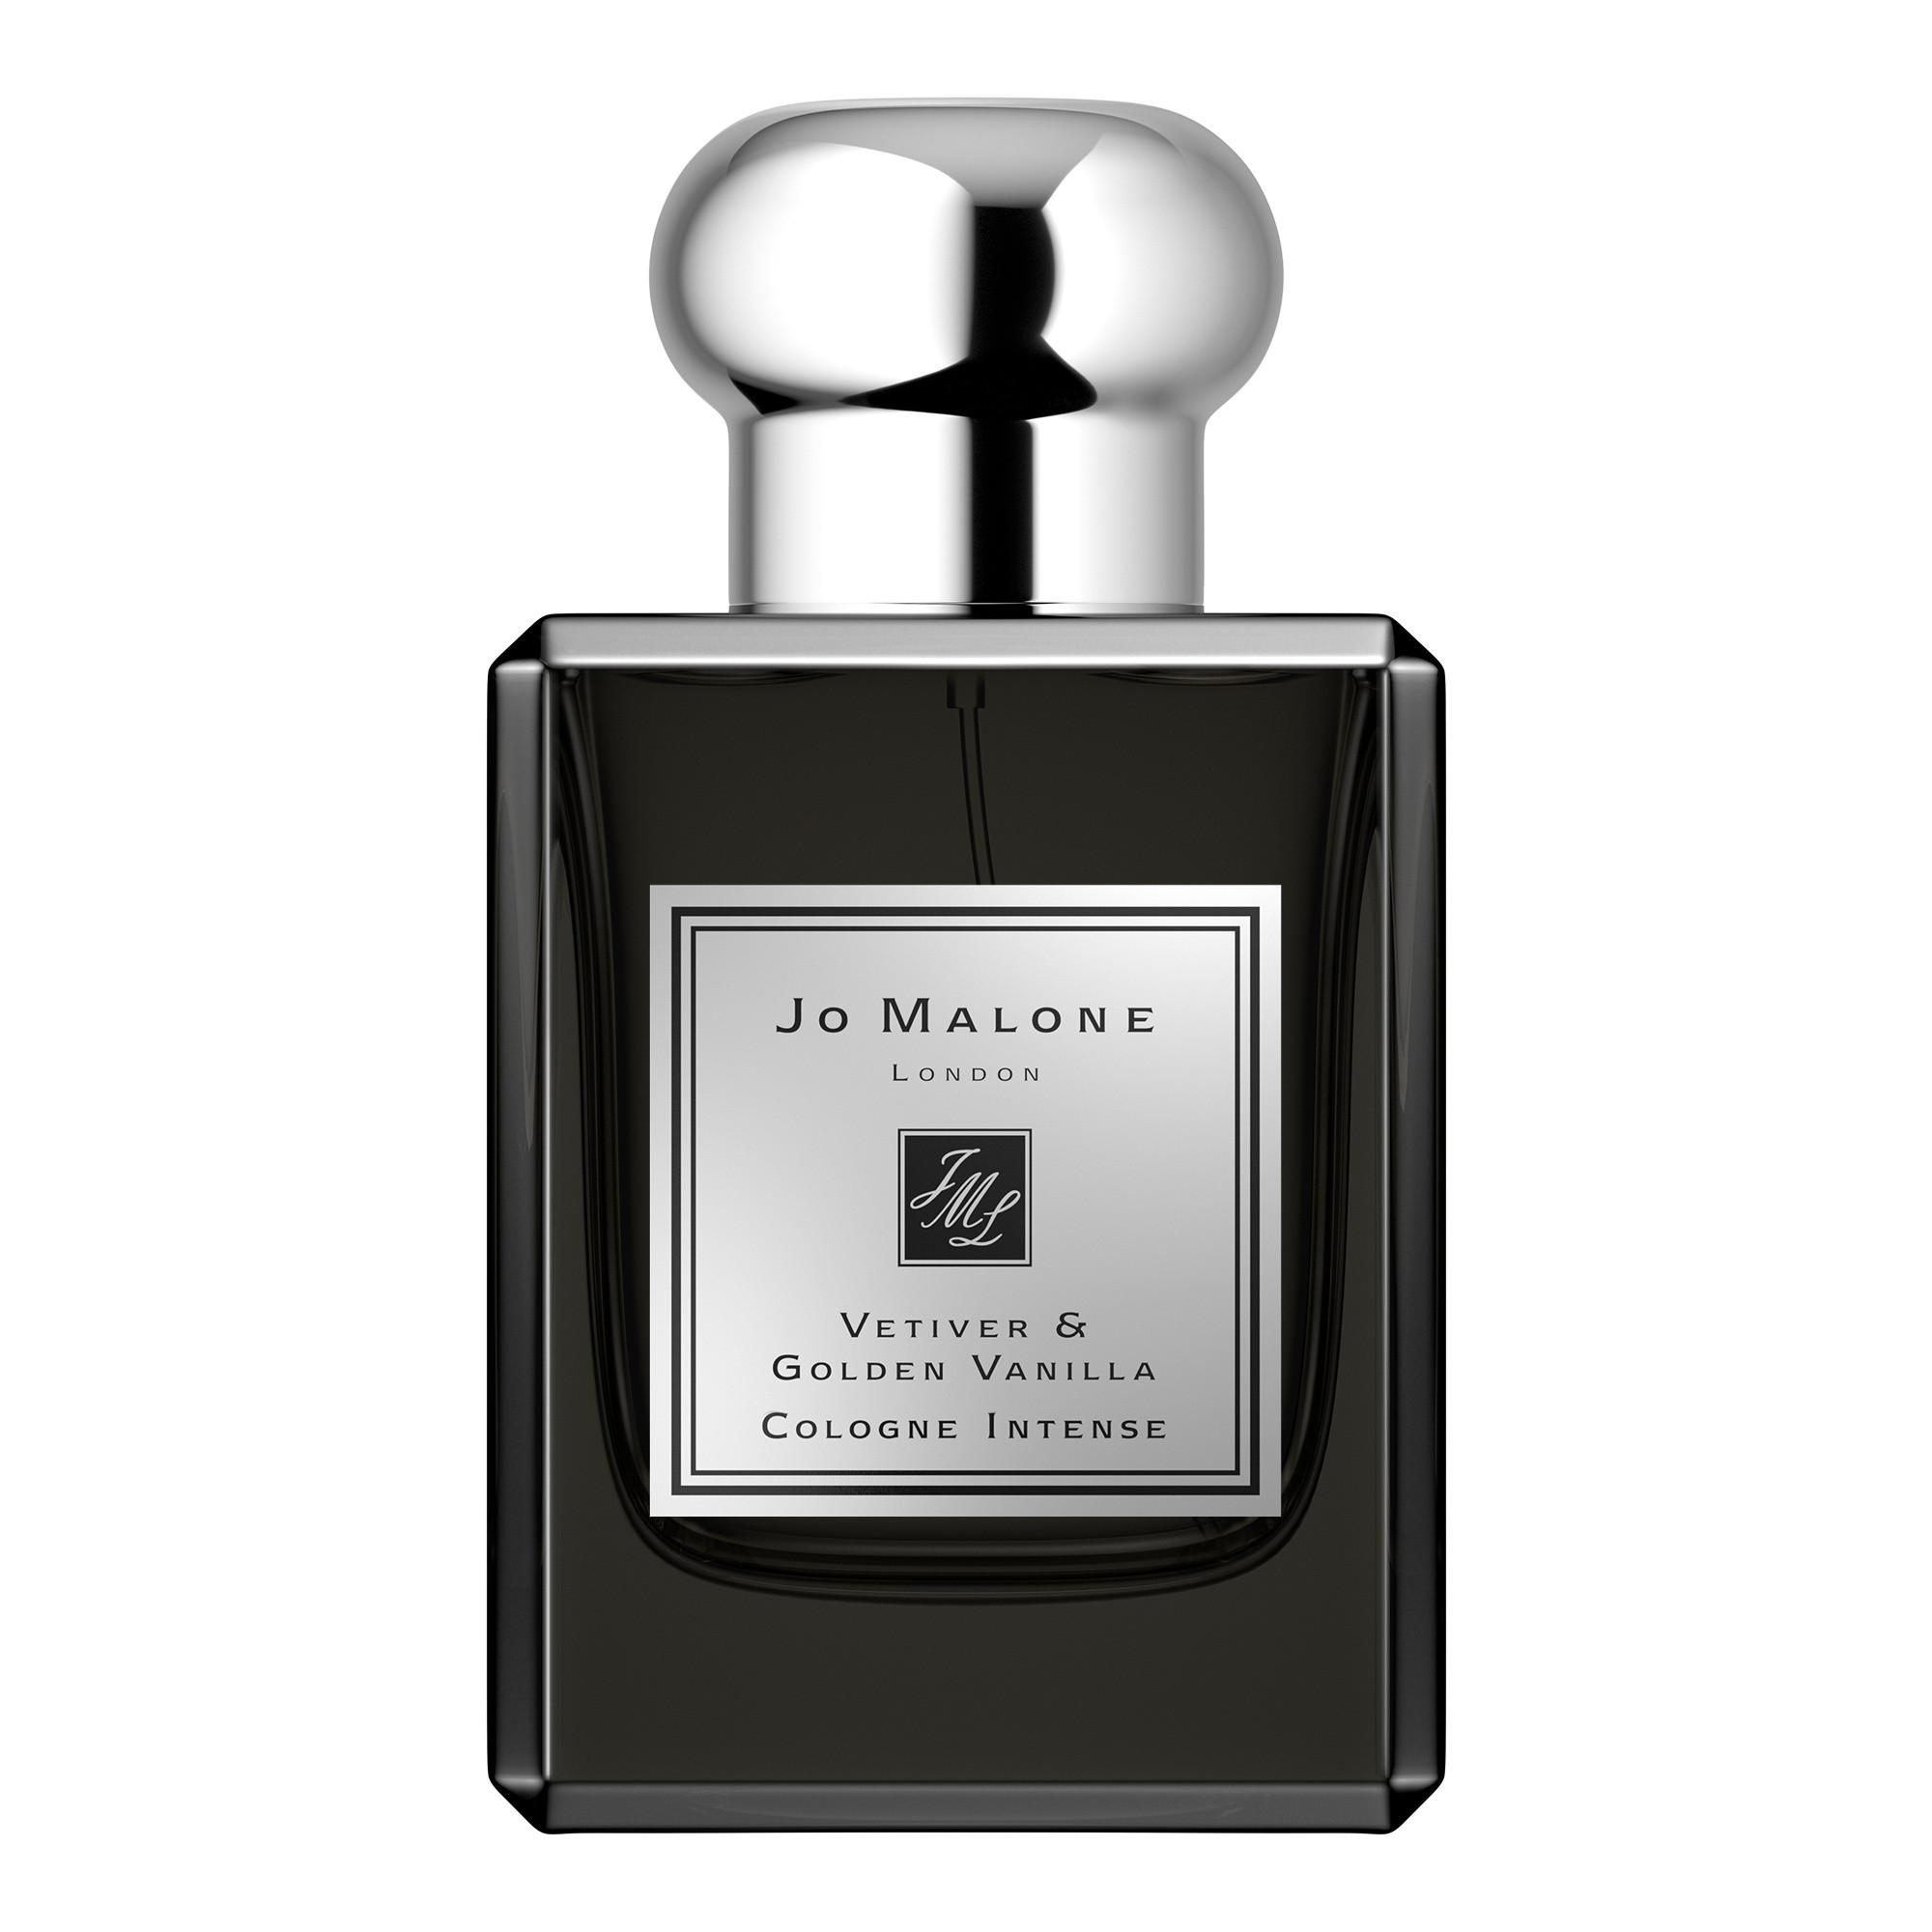 Jo Malone London vetiver & golden vanilla cologne intense 50 ml, Beige, large image number 0